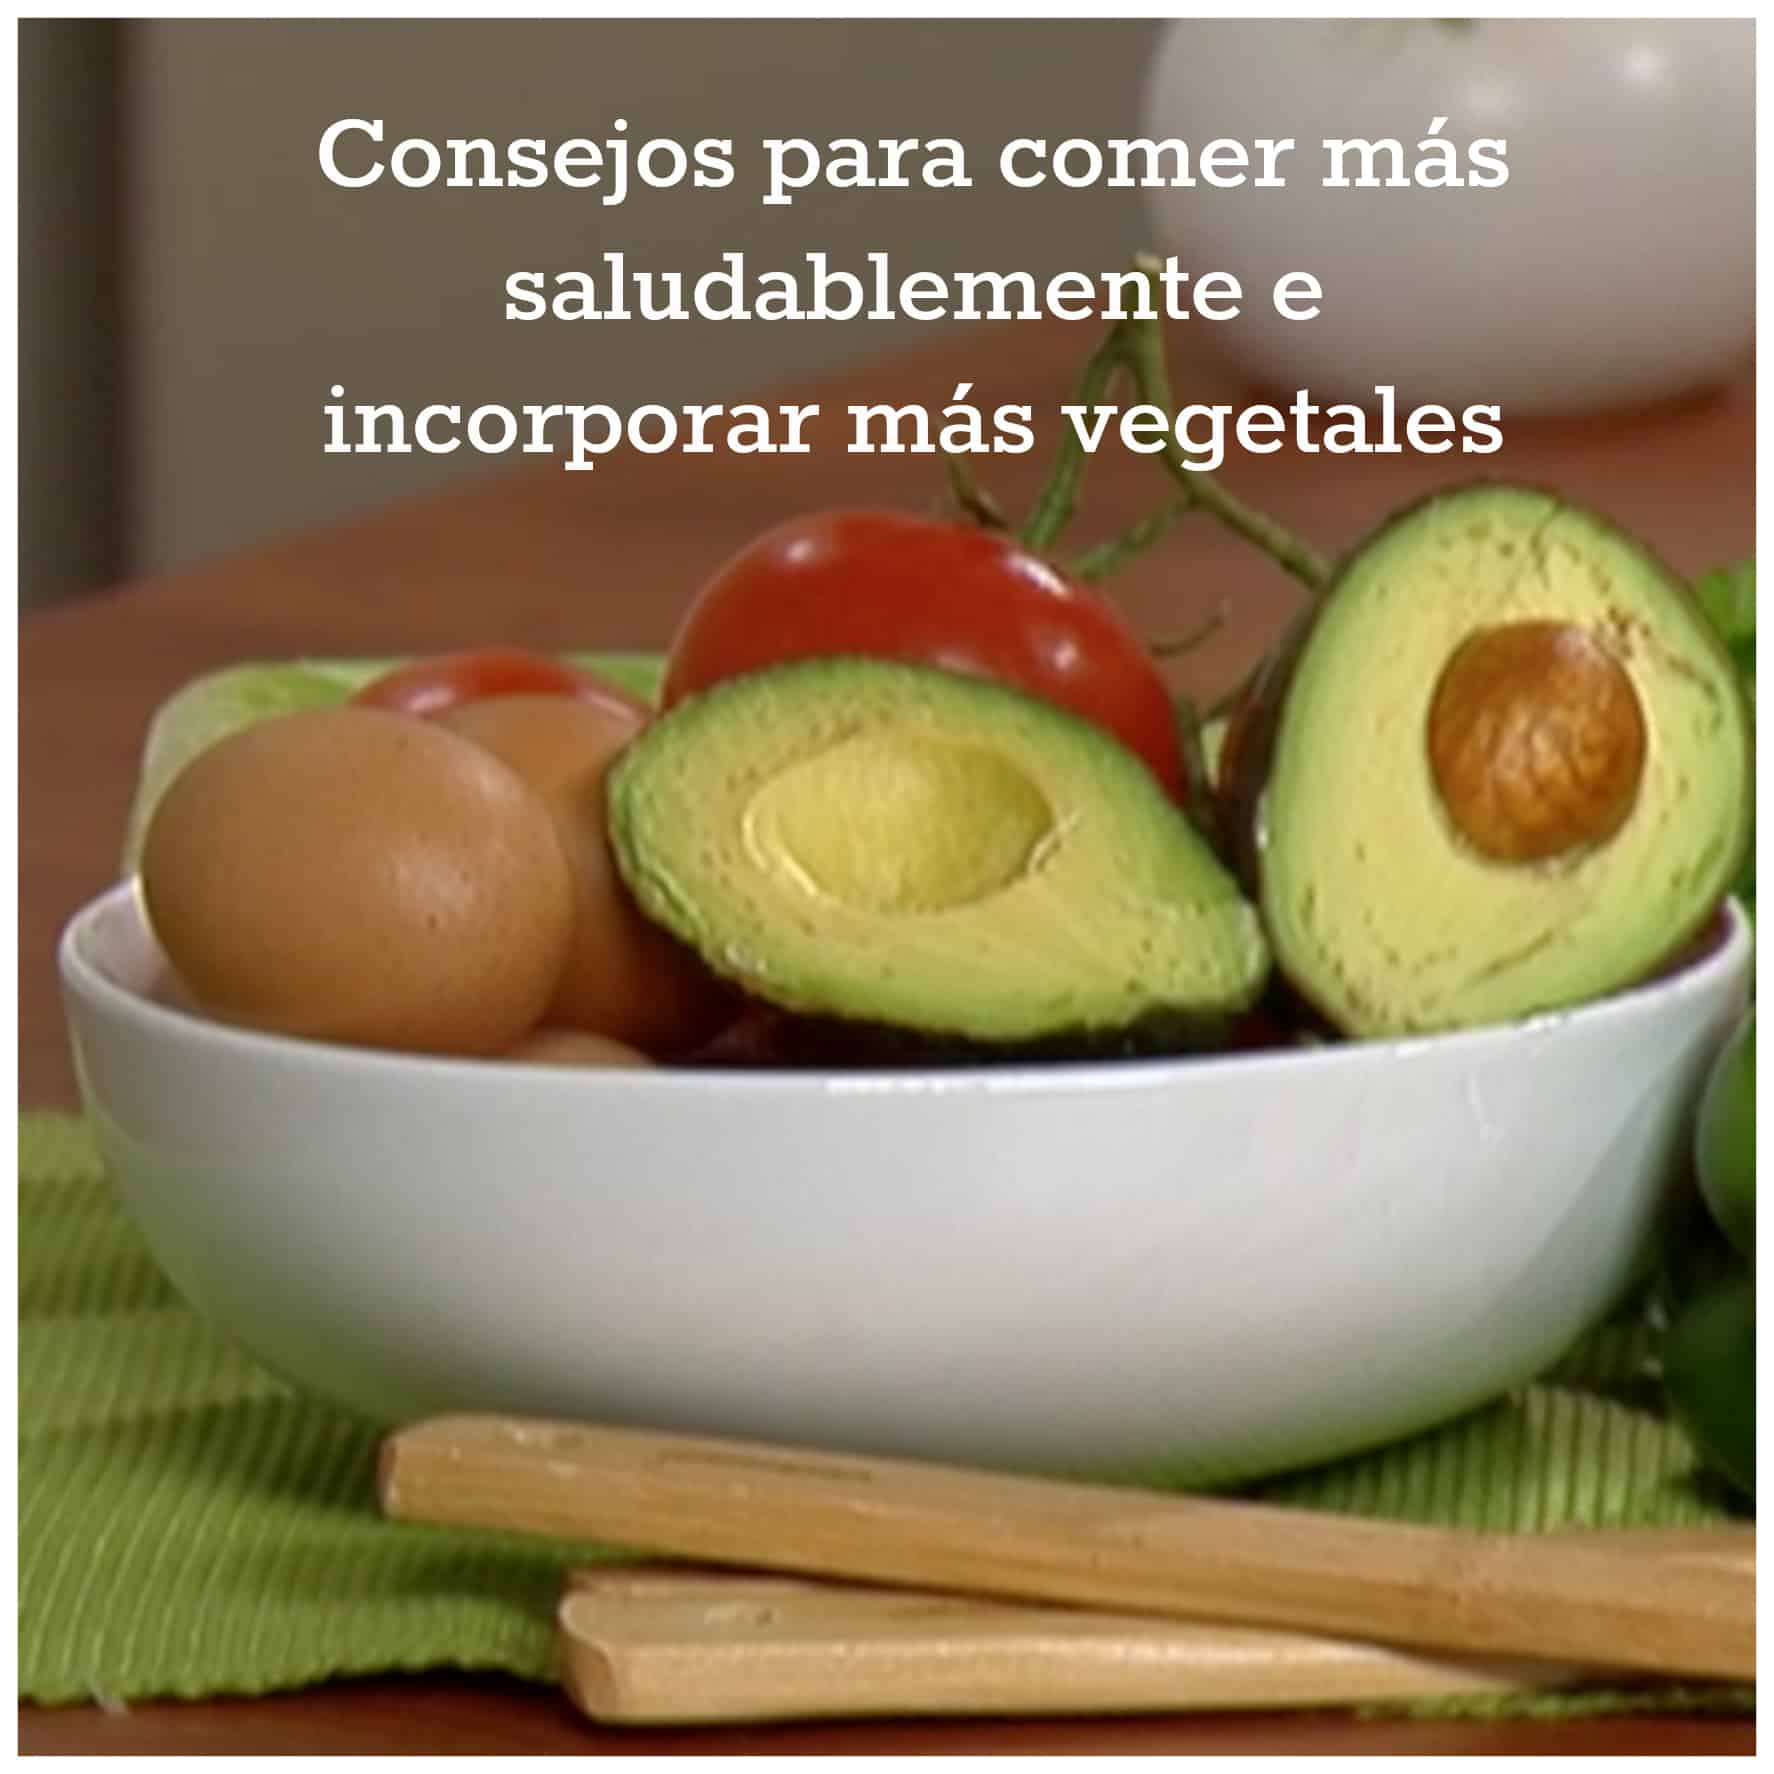 Consejos para comer saludabelmente